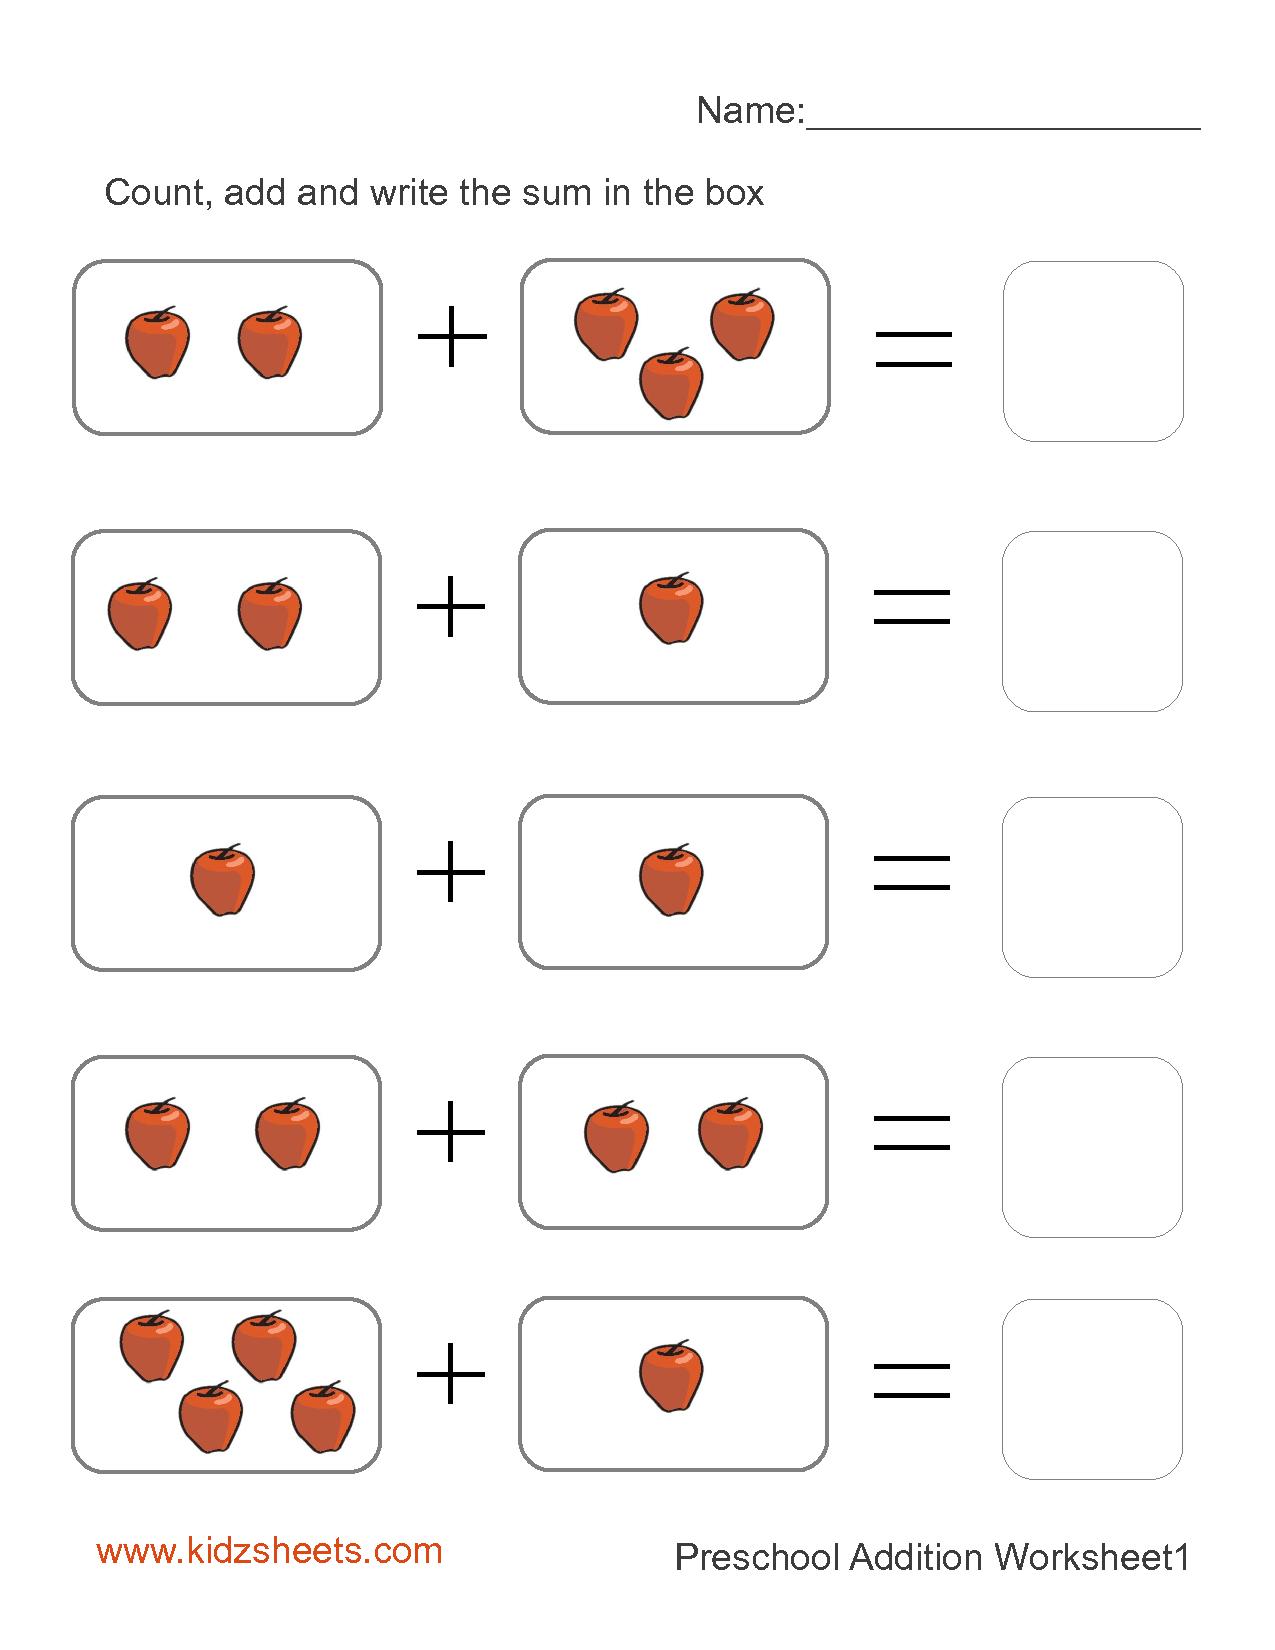 Free Printable Simple Addition Worksheets – Mreichert Kids Worksheets